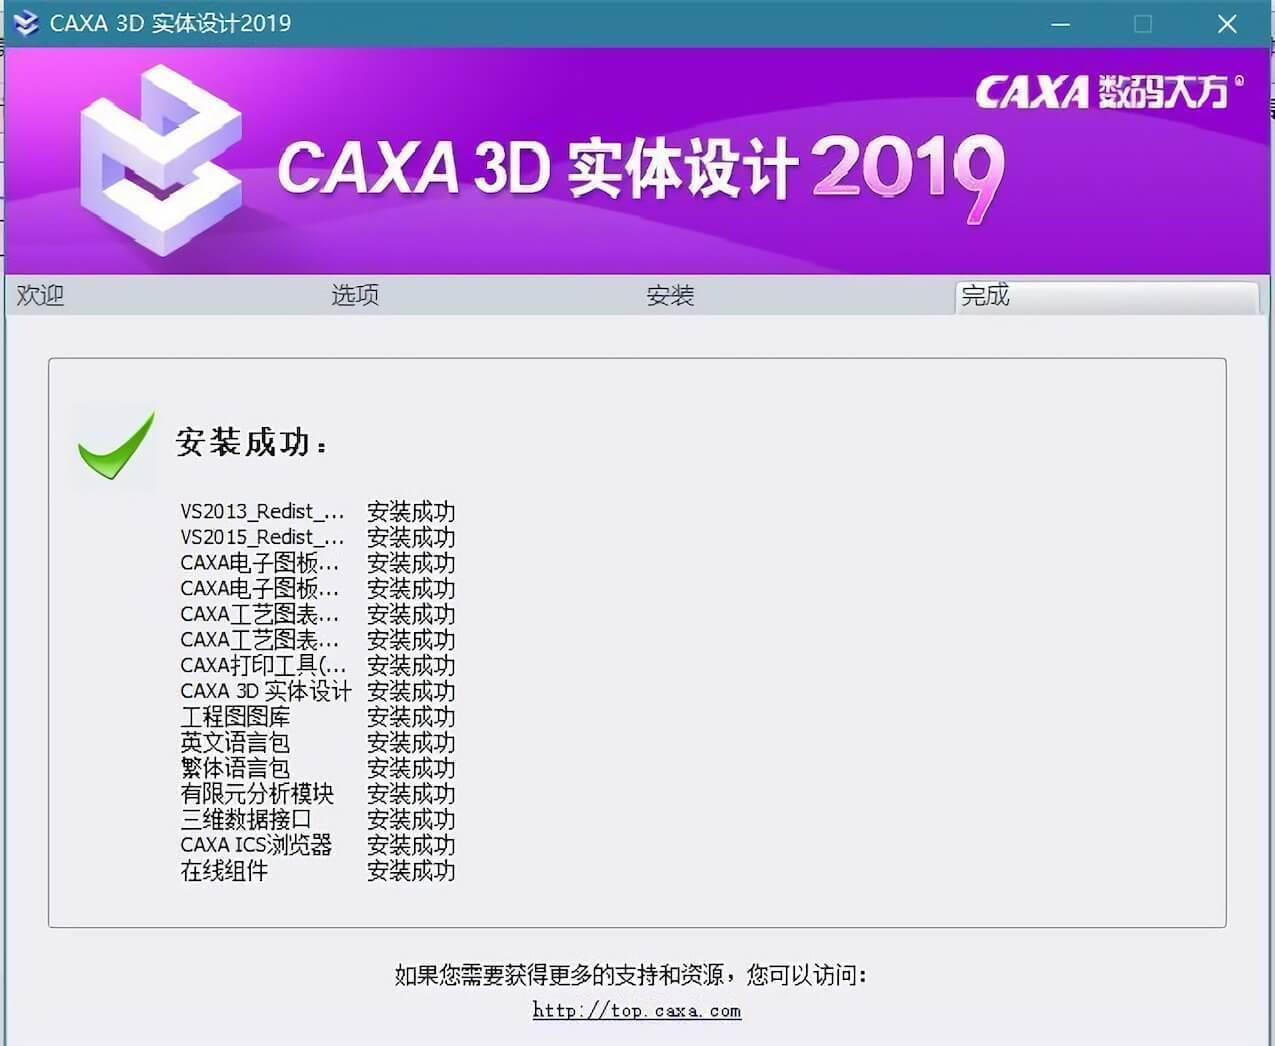 CAXA 2019 非常优秀的CAD电子图版设计软件